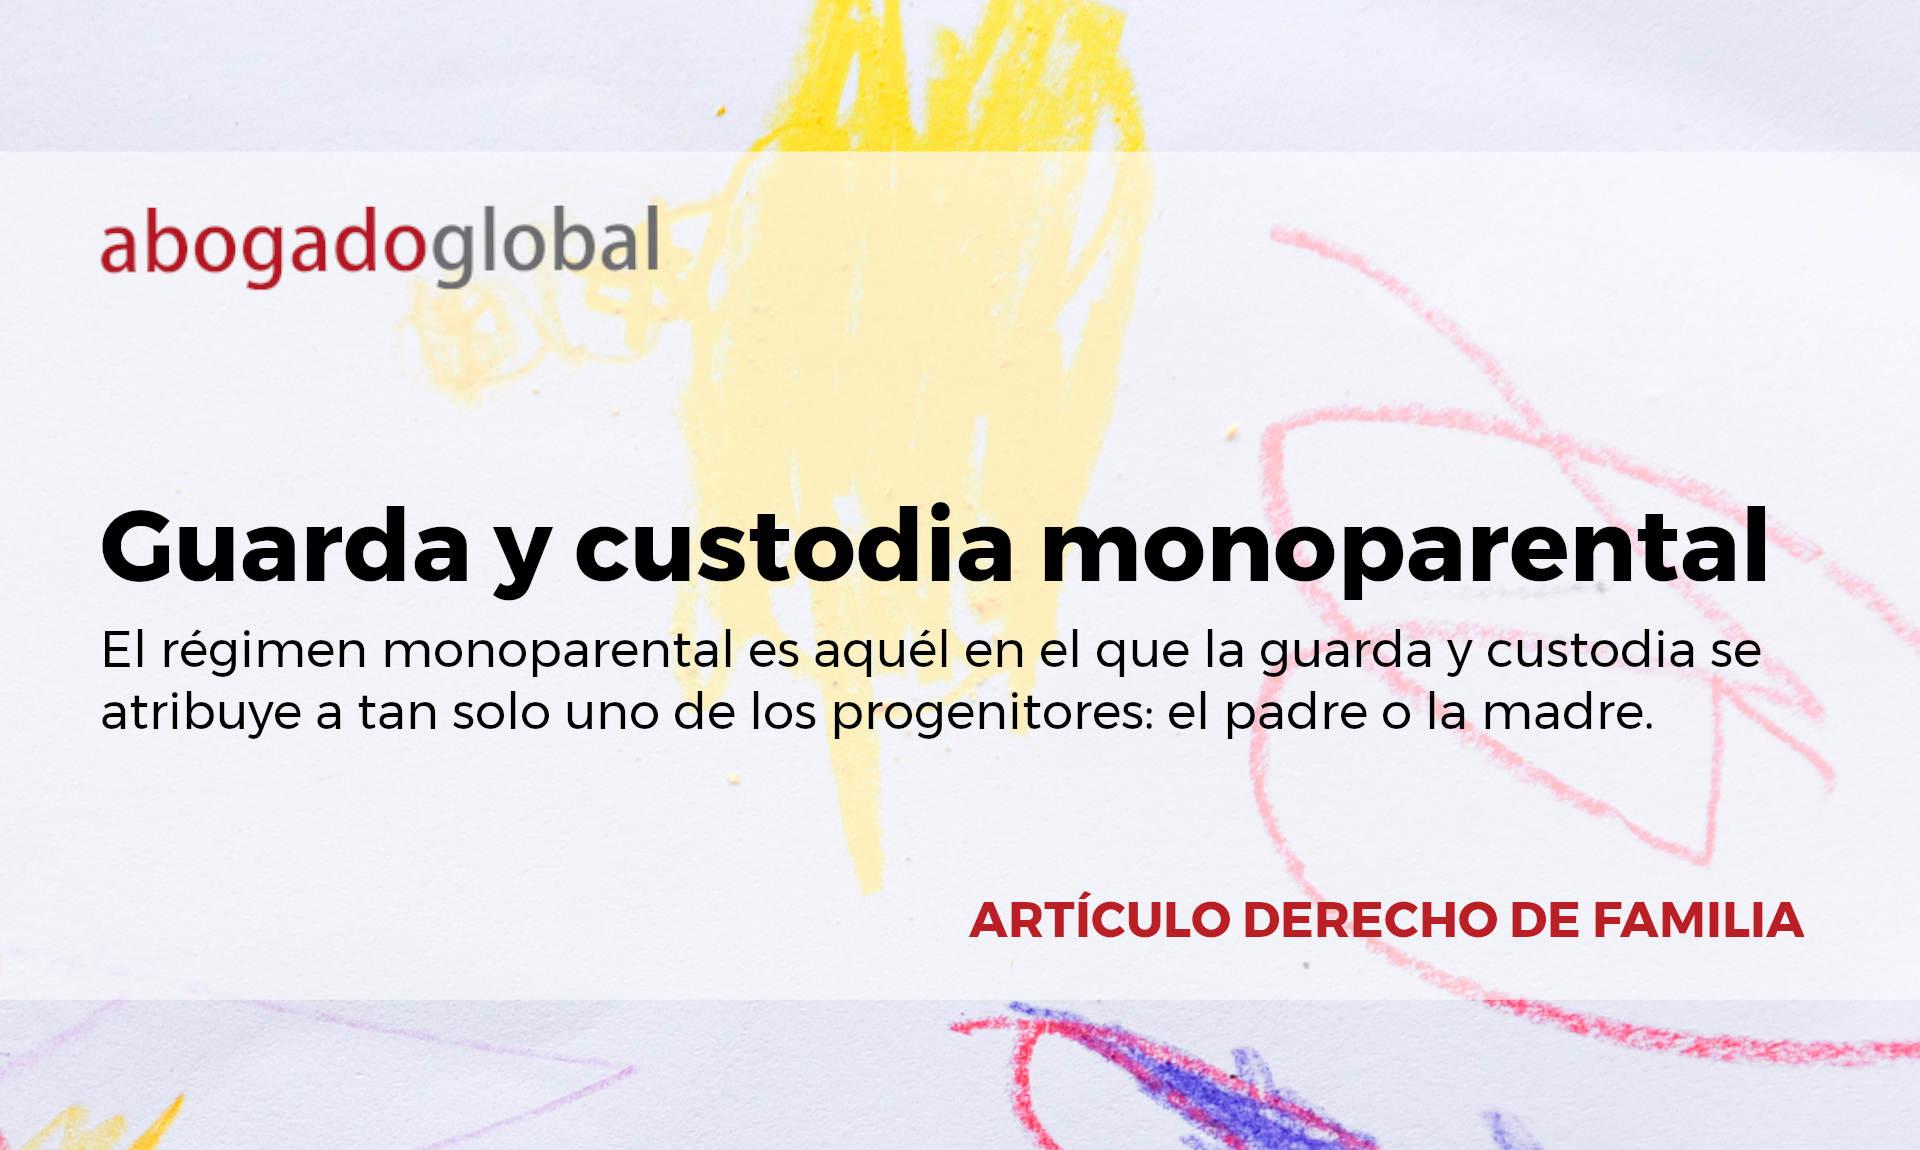 guardia y custodia monoparental_Abogado Global